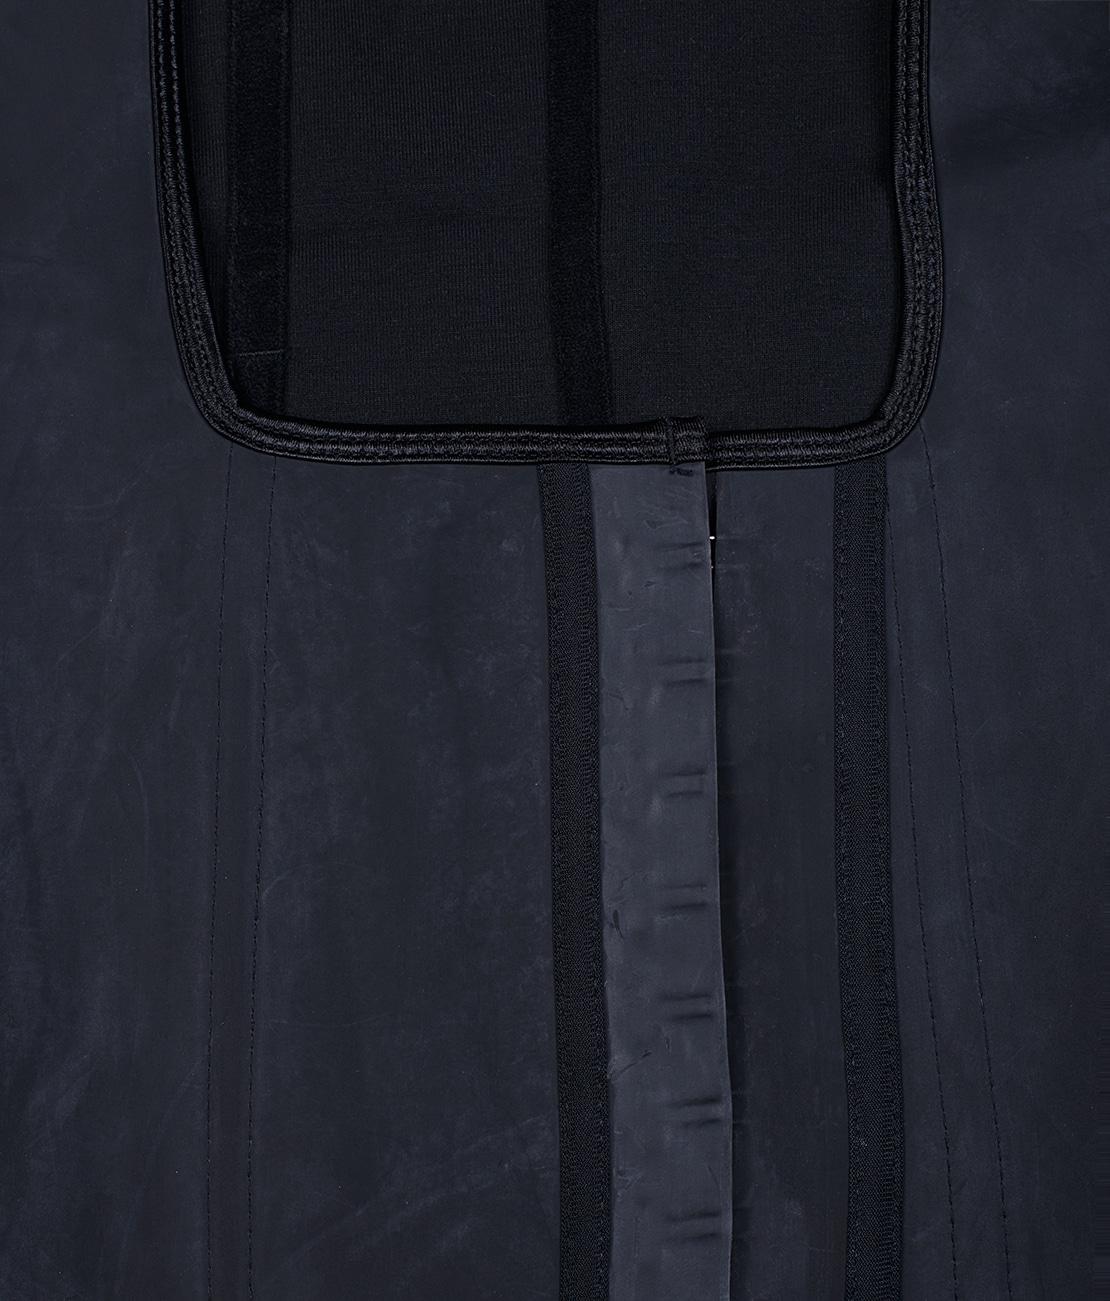 Corset Femme Packshot Detail 1